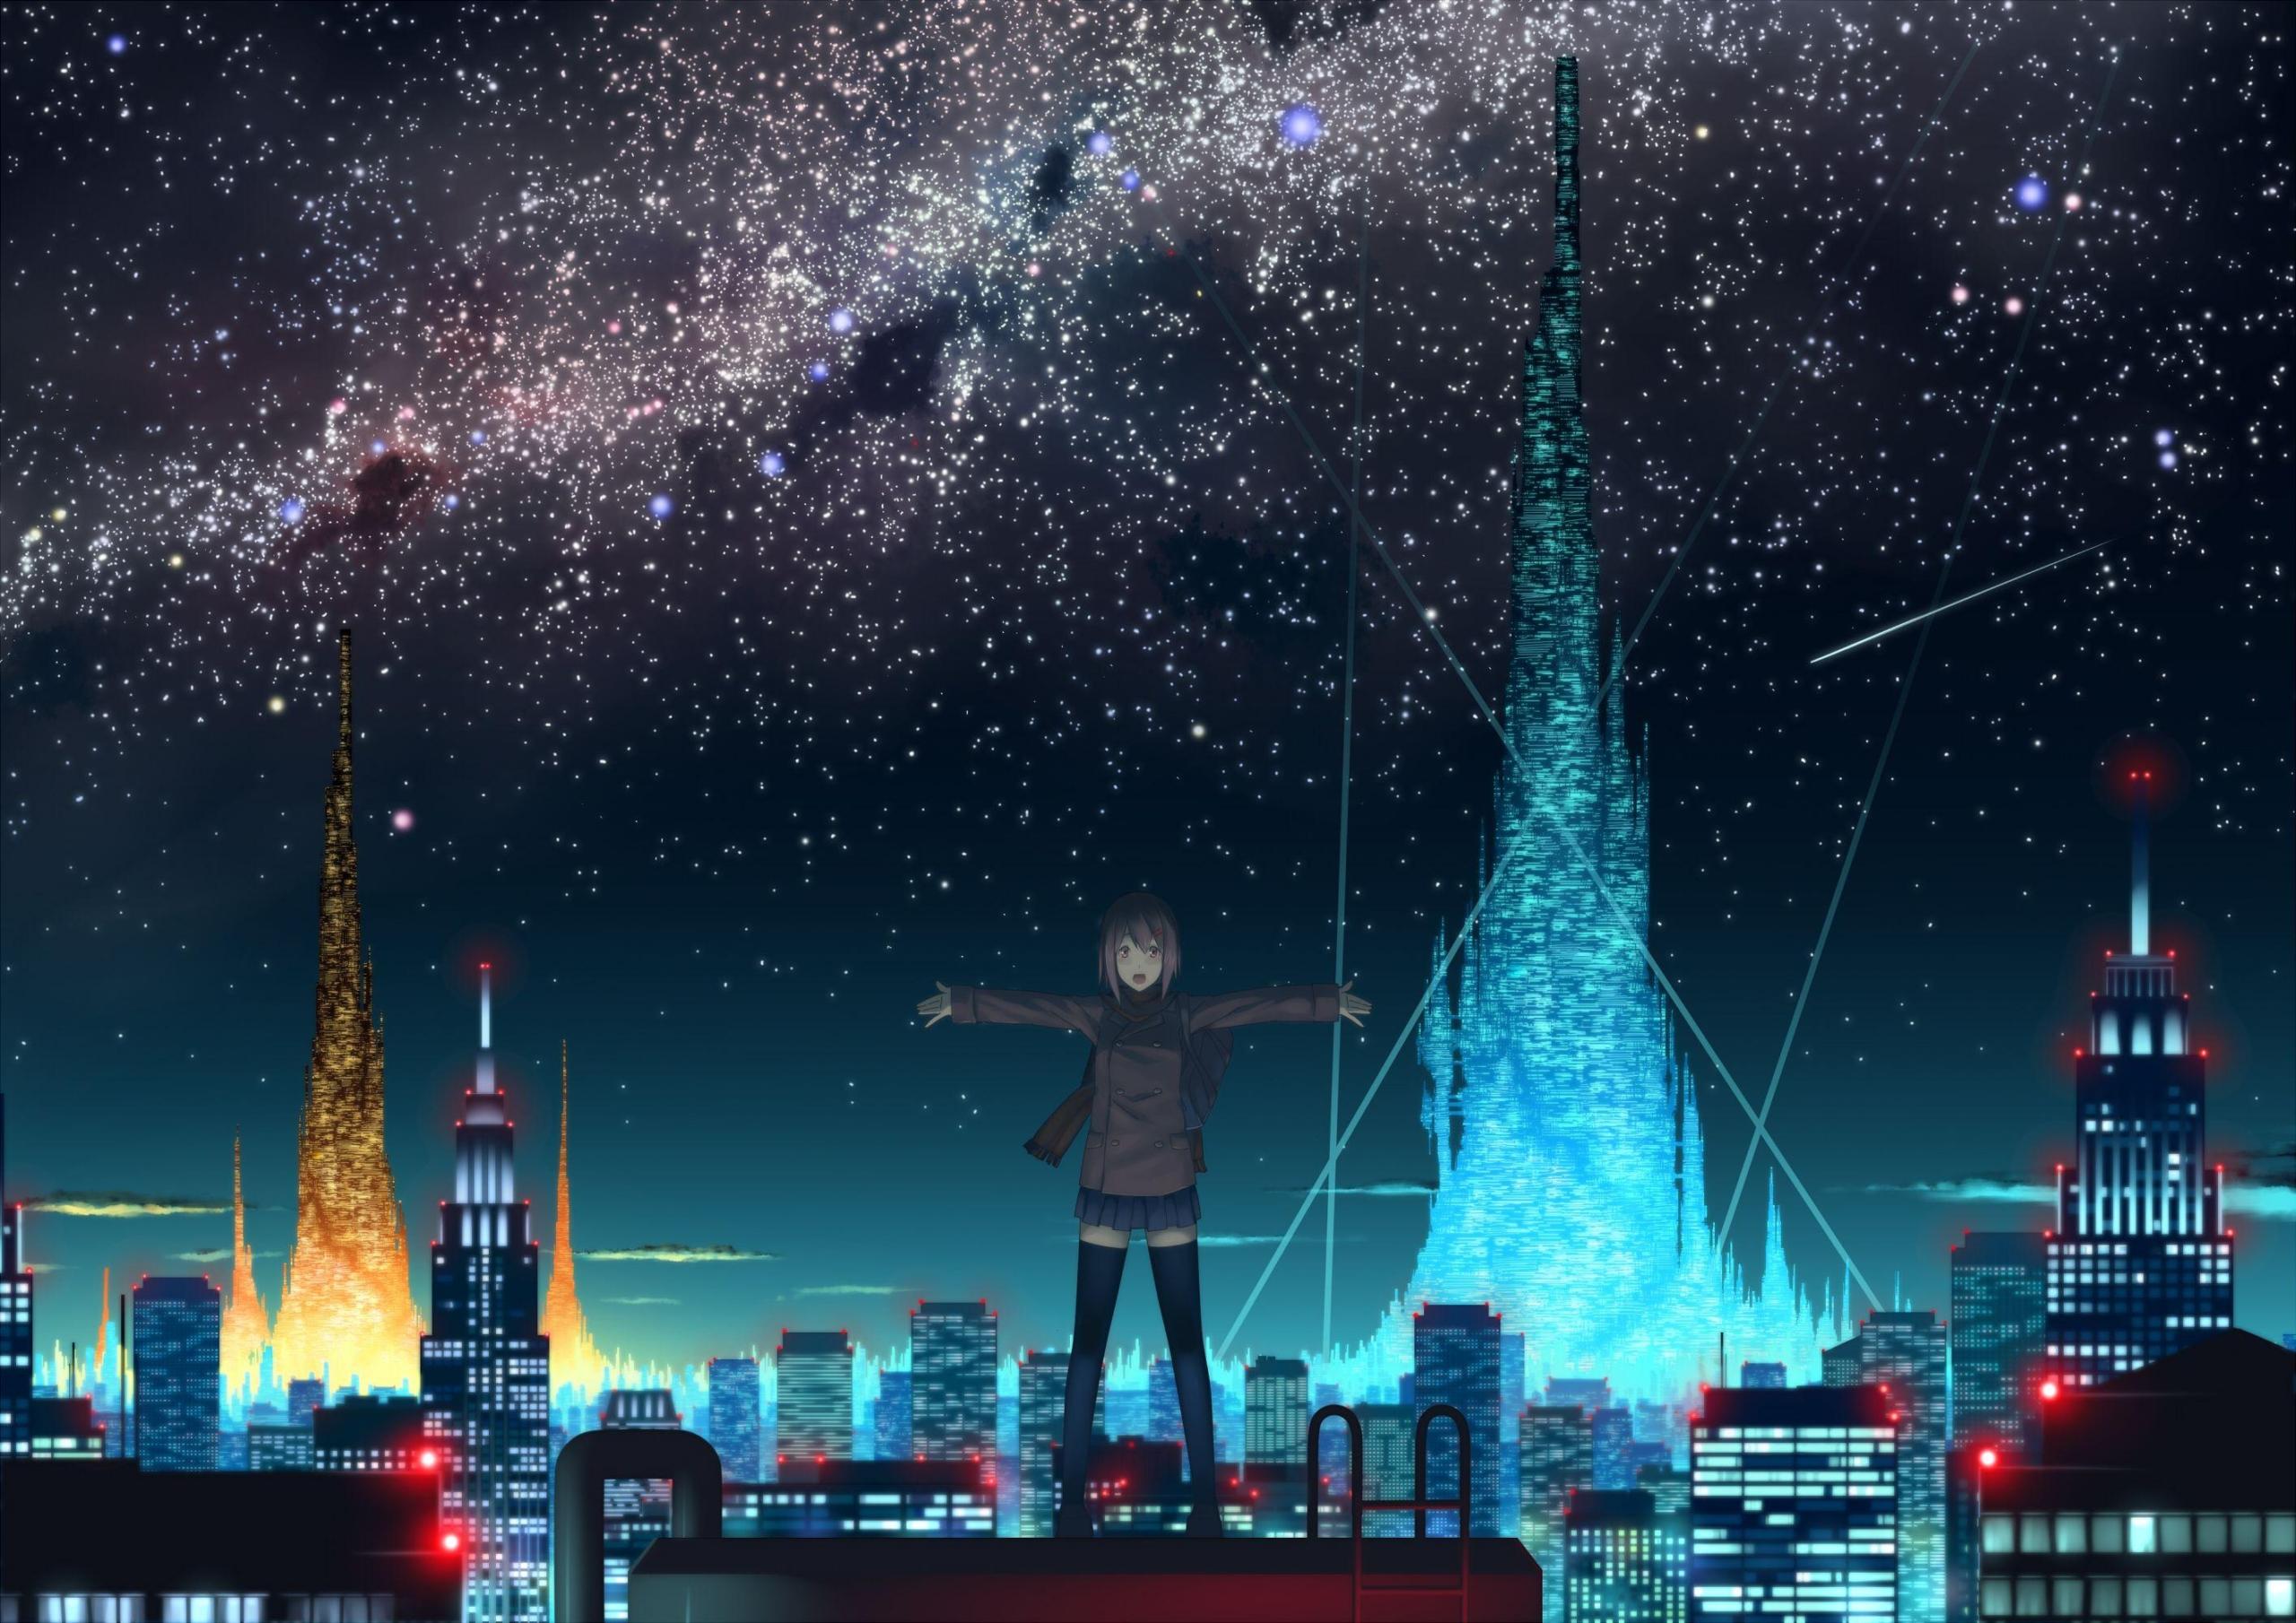 Anime City Wallpaper – Unique Wallpaper design For Your Computer